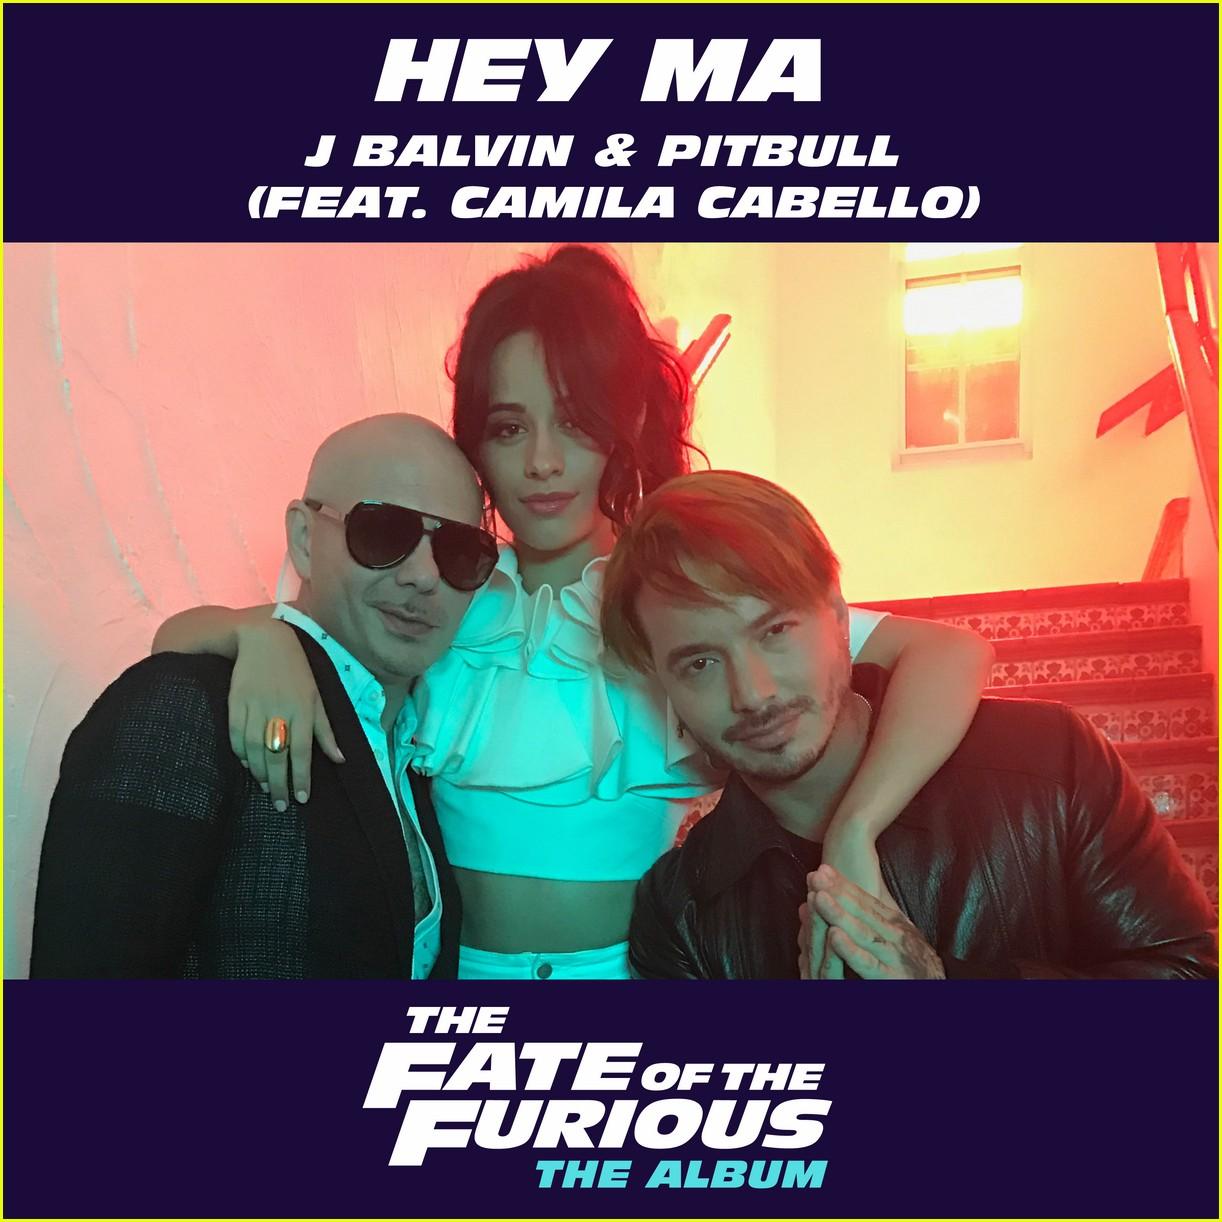 watch pitbull camila cabello and j balvin in hey ma english vesion music video 023883545